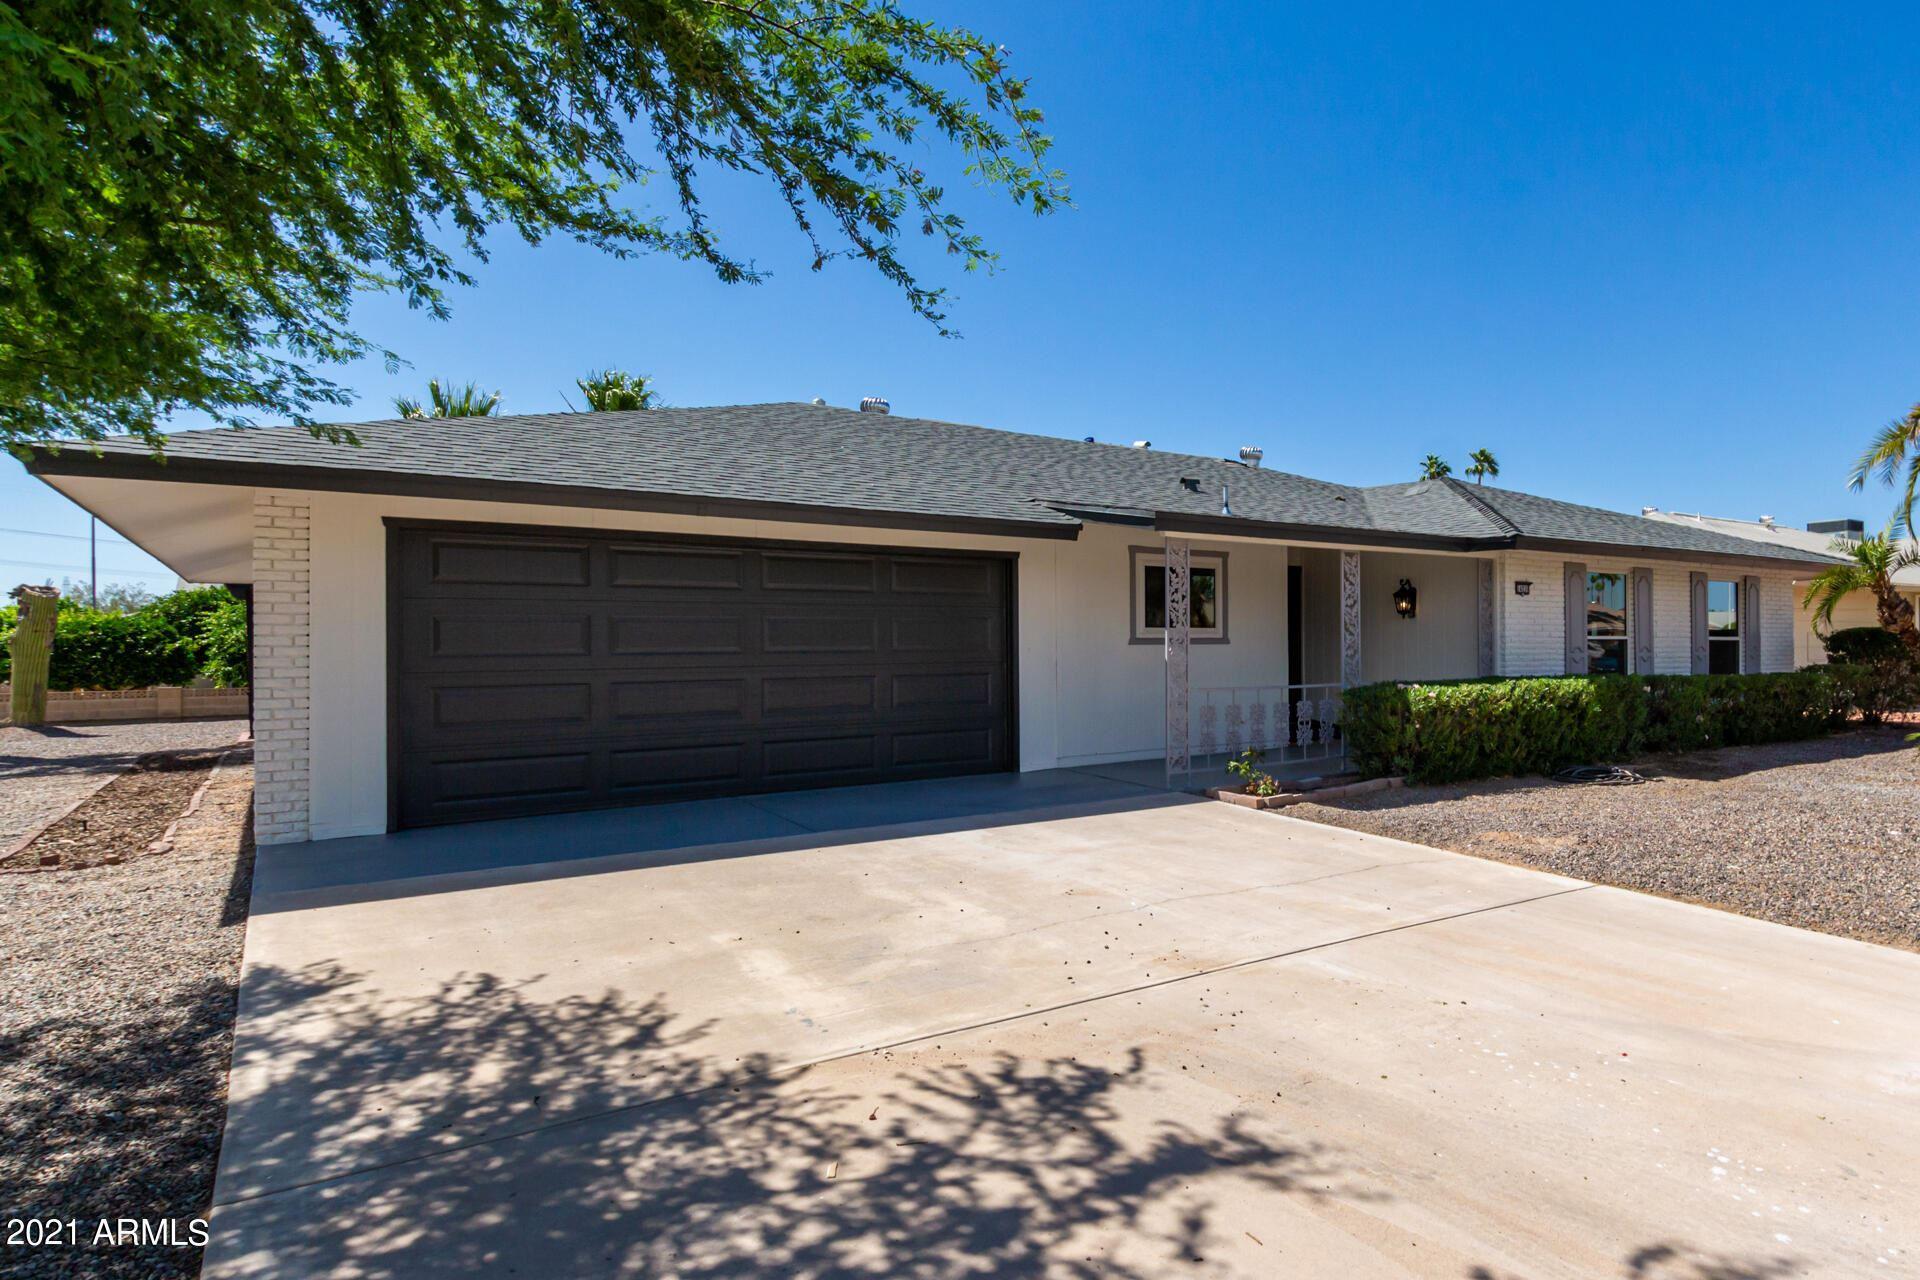 Photo of 14230 N SARABANDE Way, Sun City, AZ 85351 (MLS # 6249289)